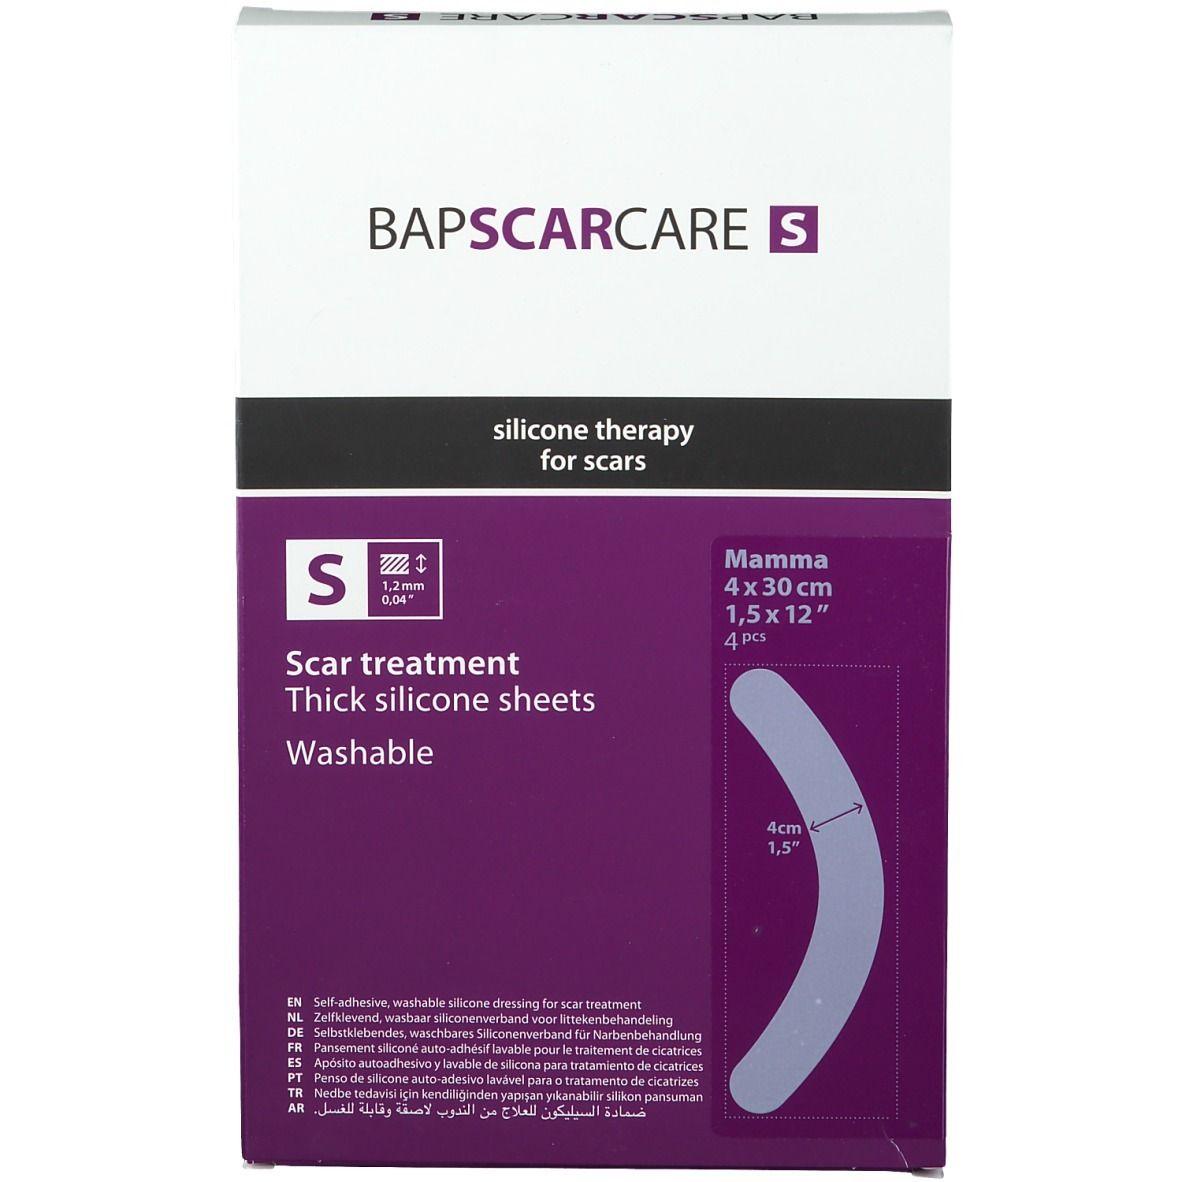 Image of BAPSCARCARE S Mamma 4 x 30 cm